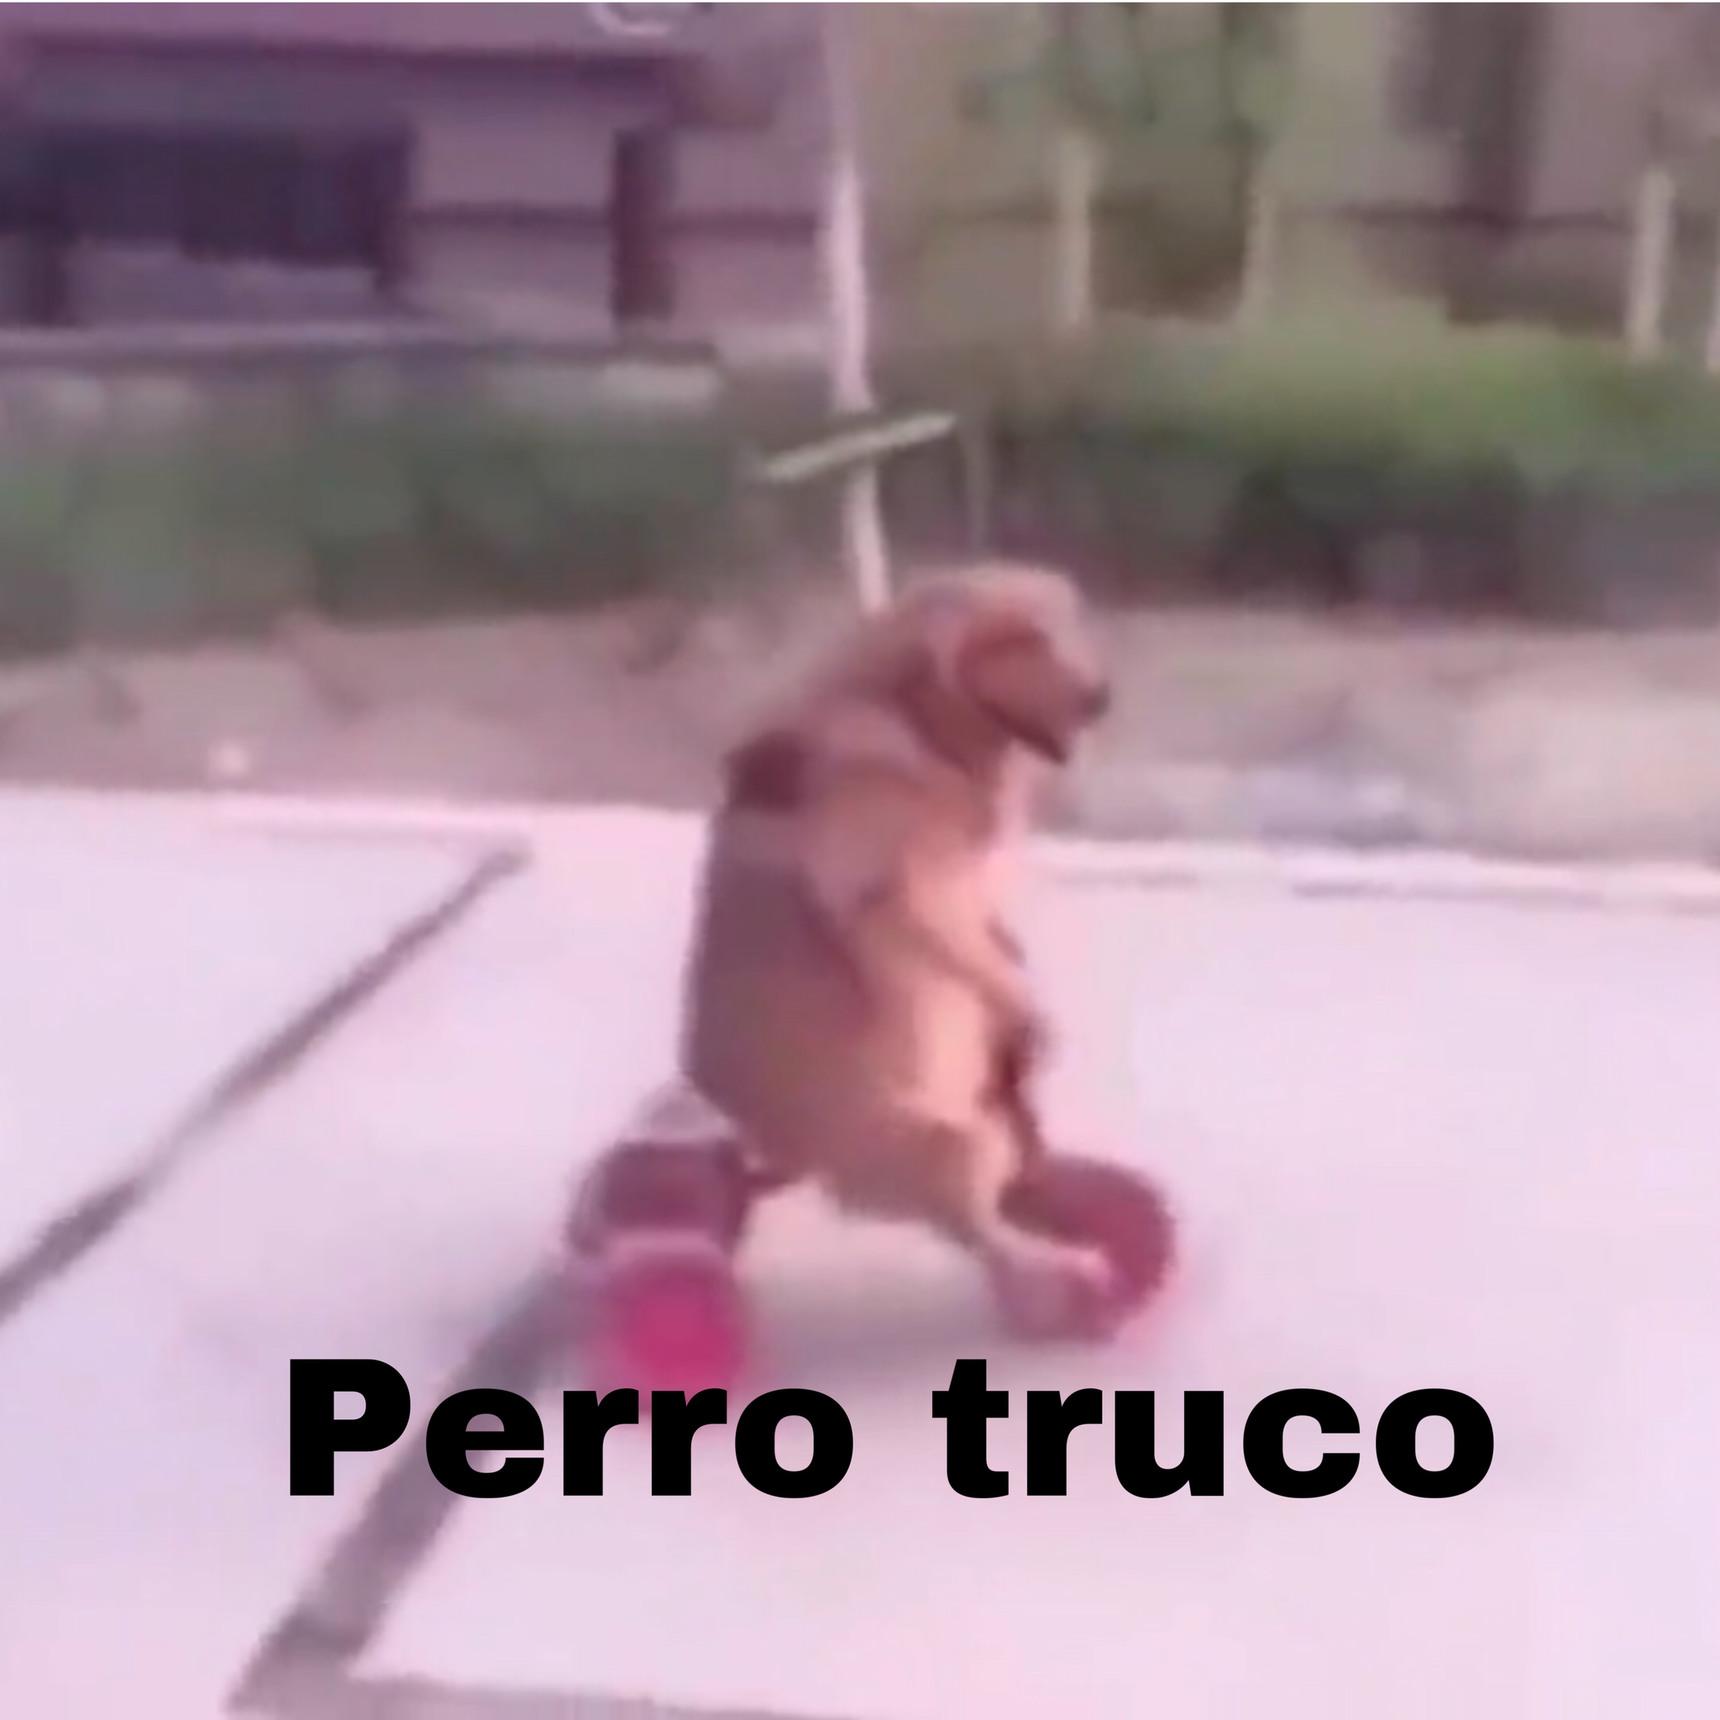 Perro truco - meme